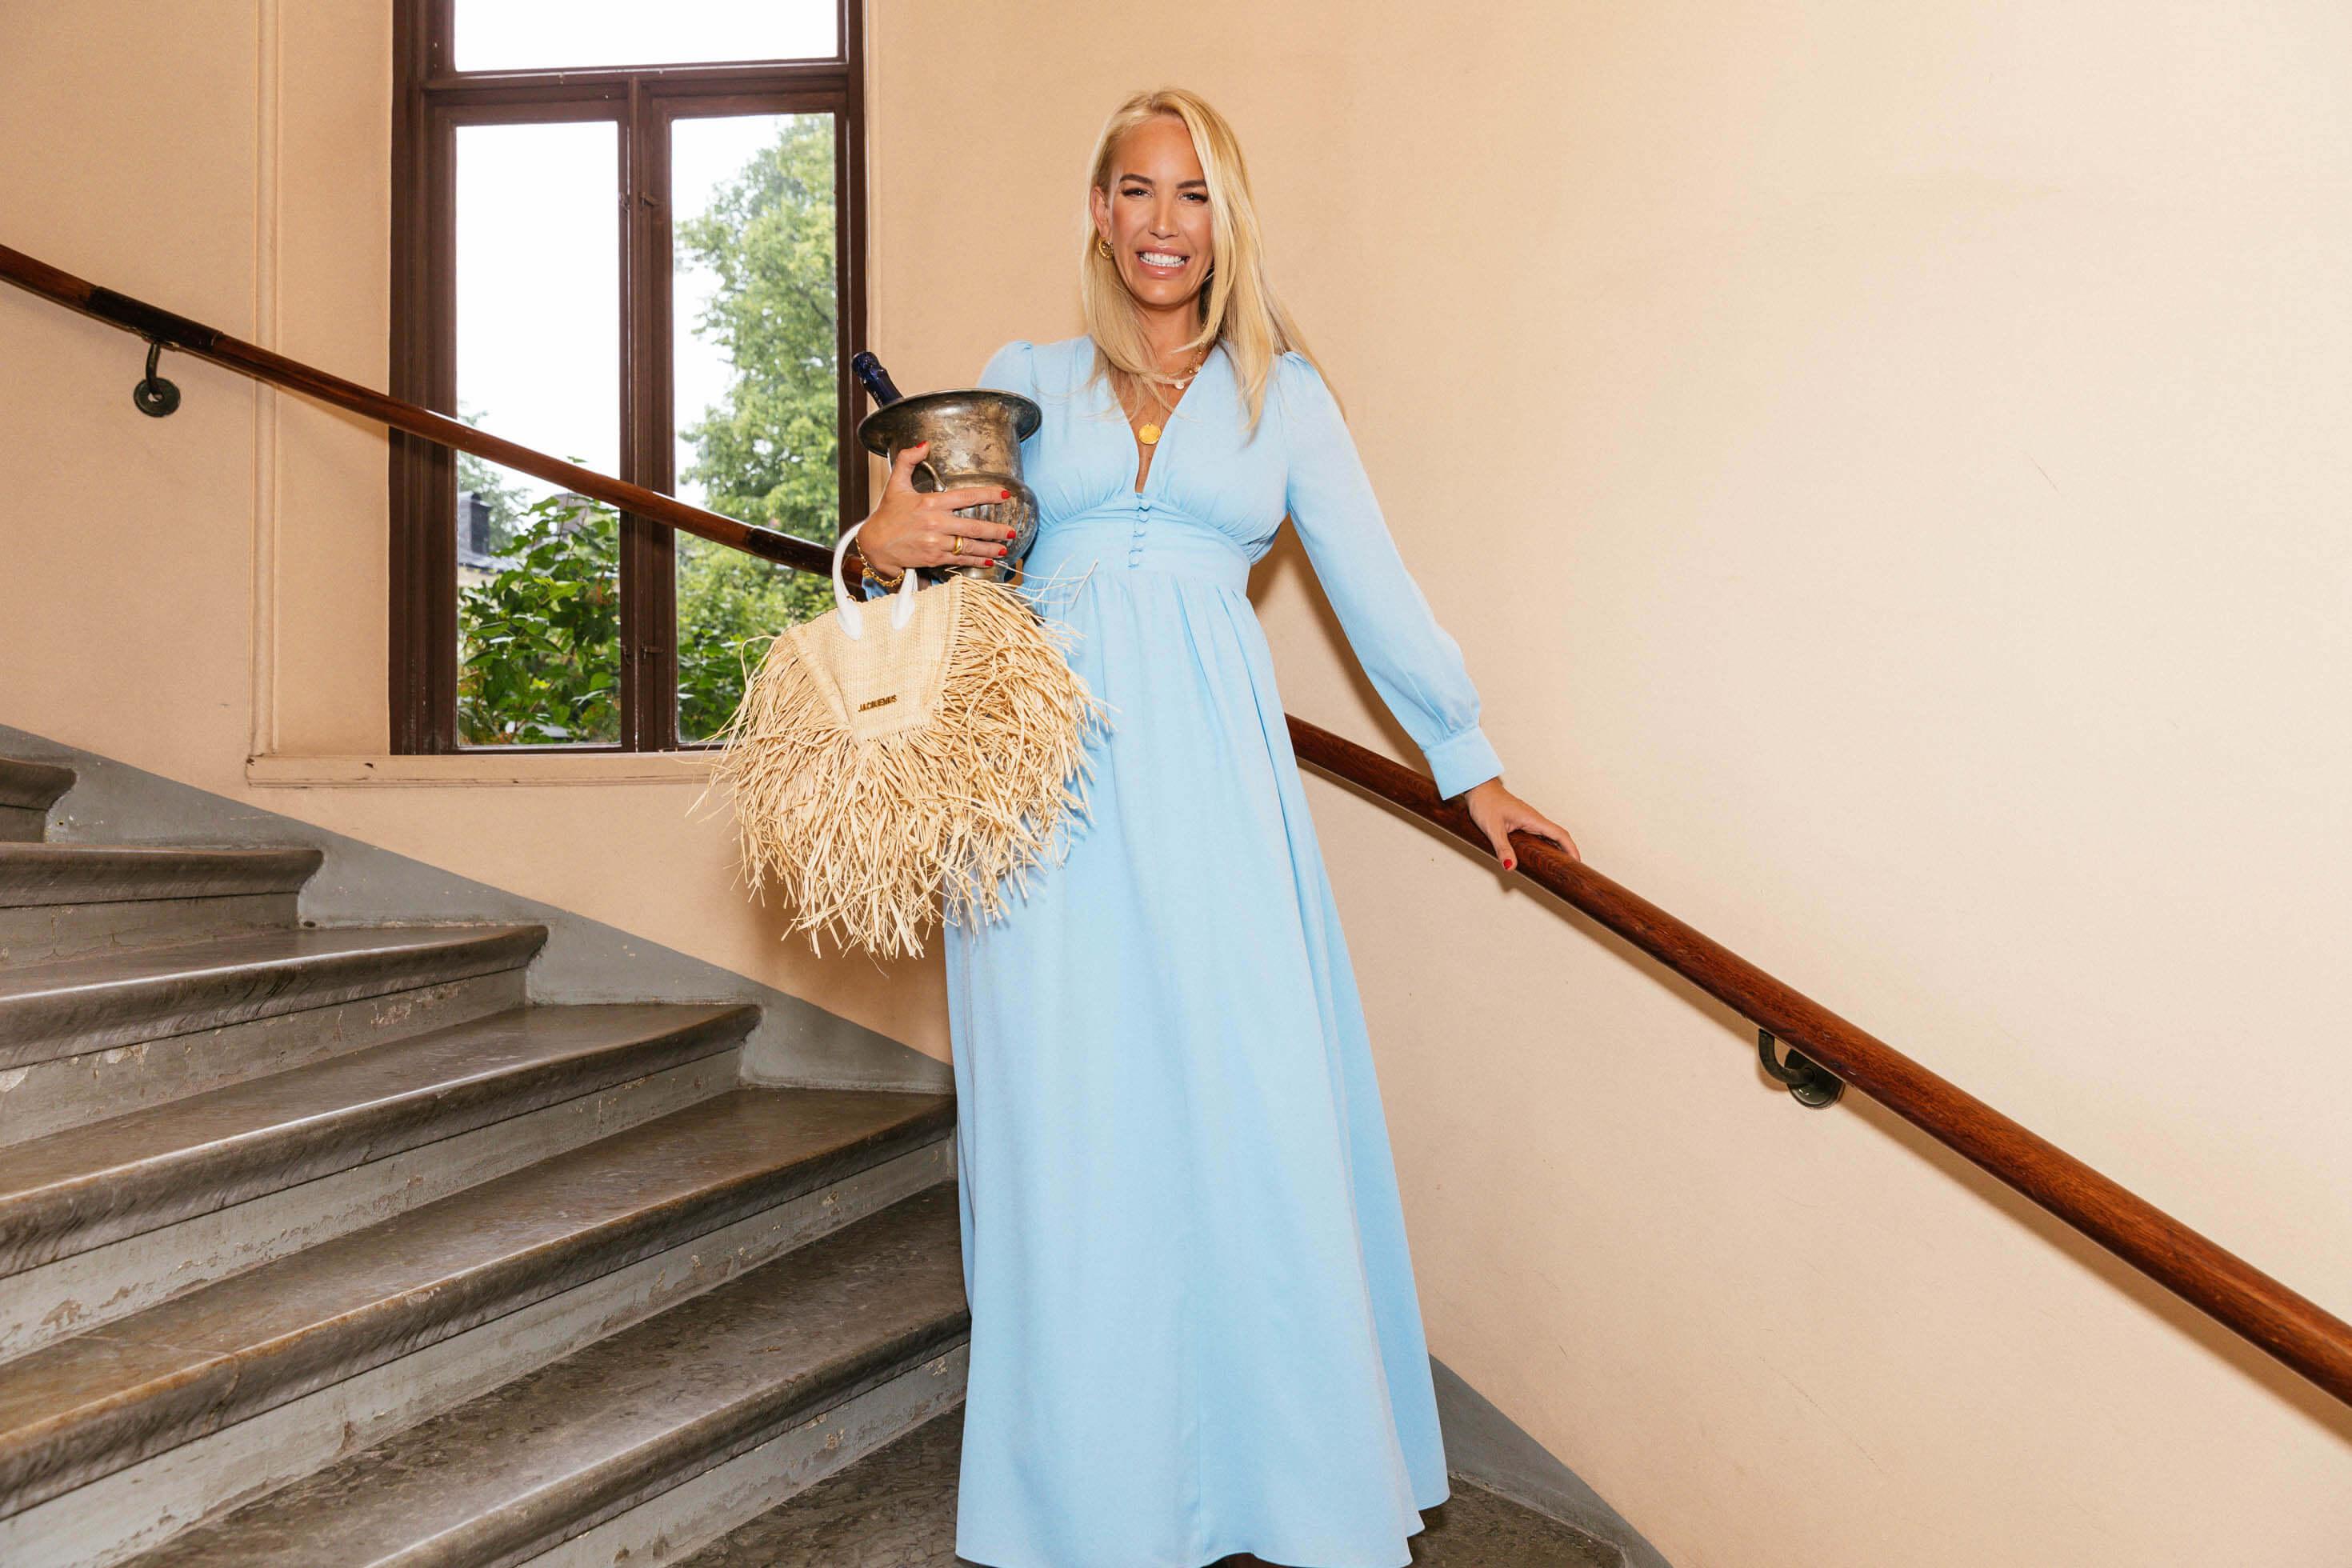 Adoore Napoli Dress